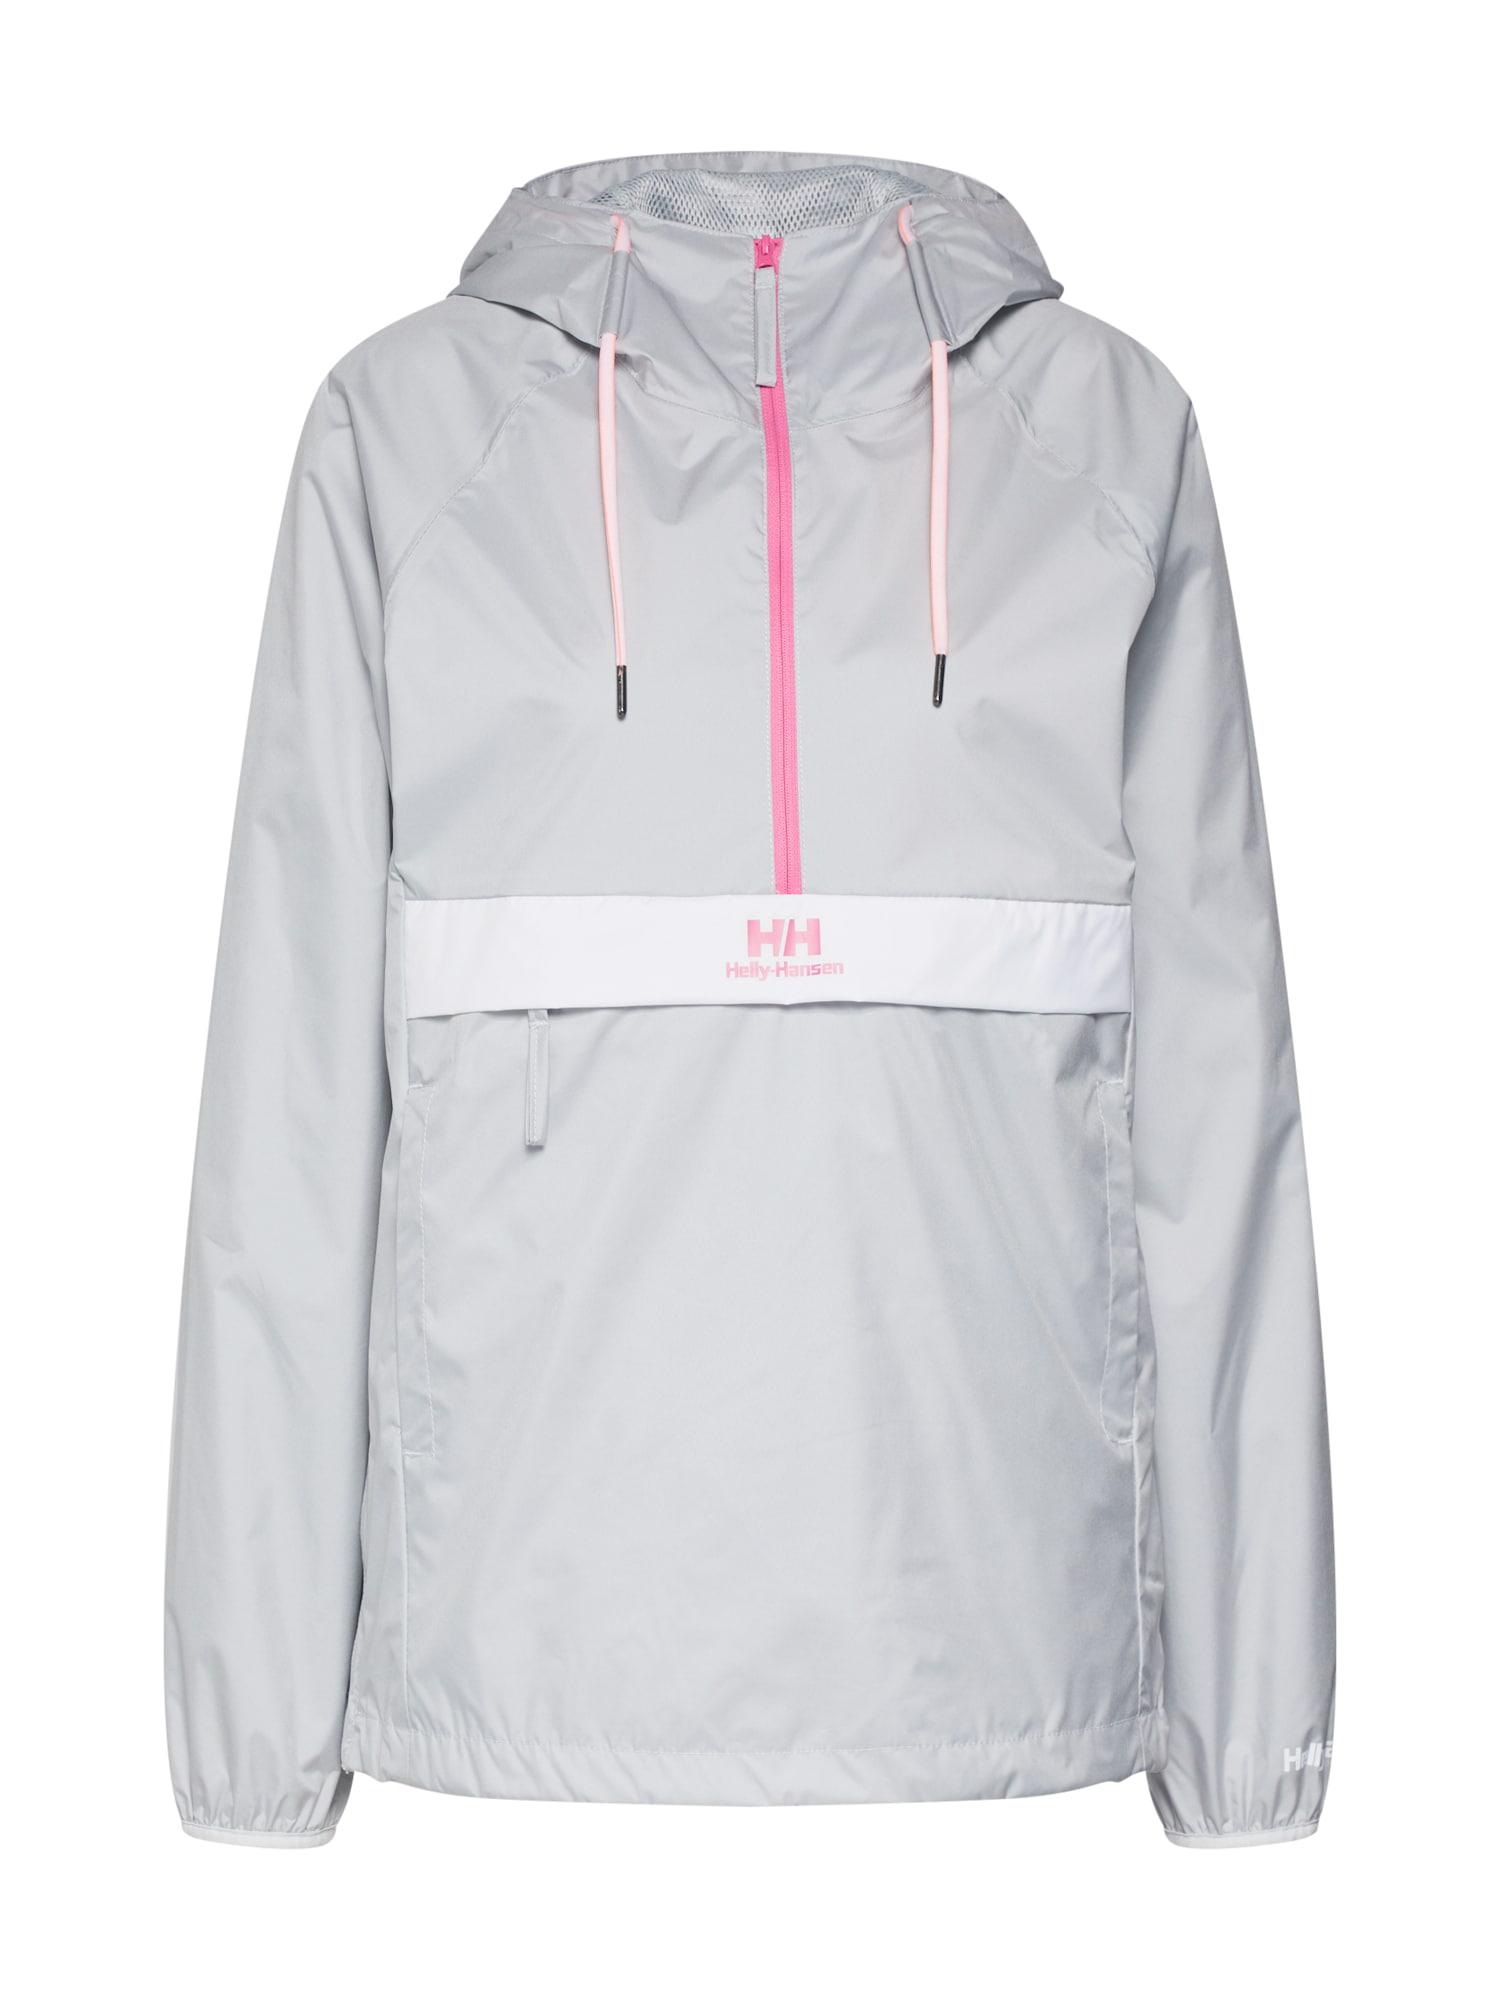 Přechodná bunda URBAN šedá pink bílá HELLY HANSEN